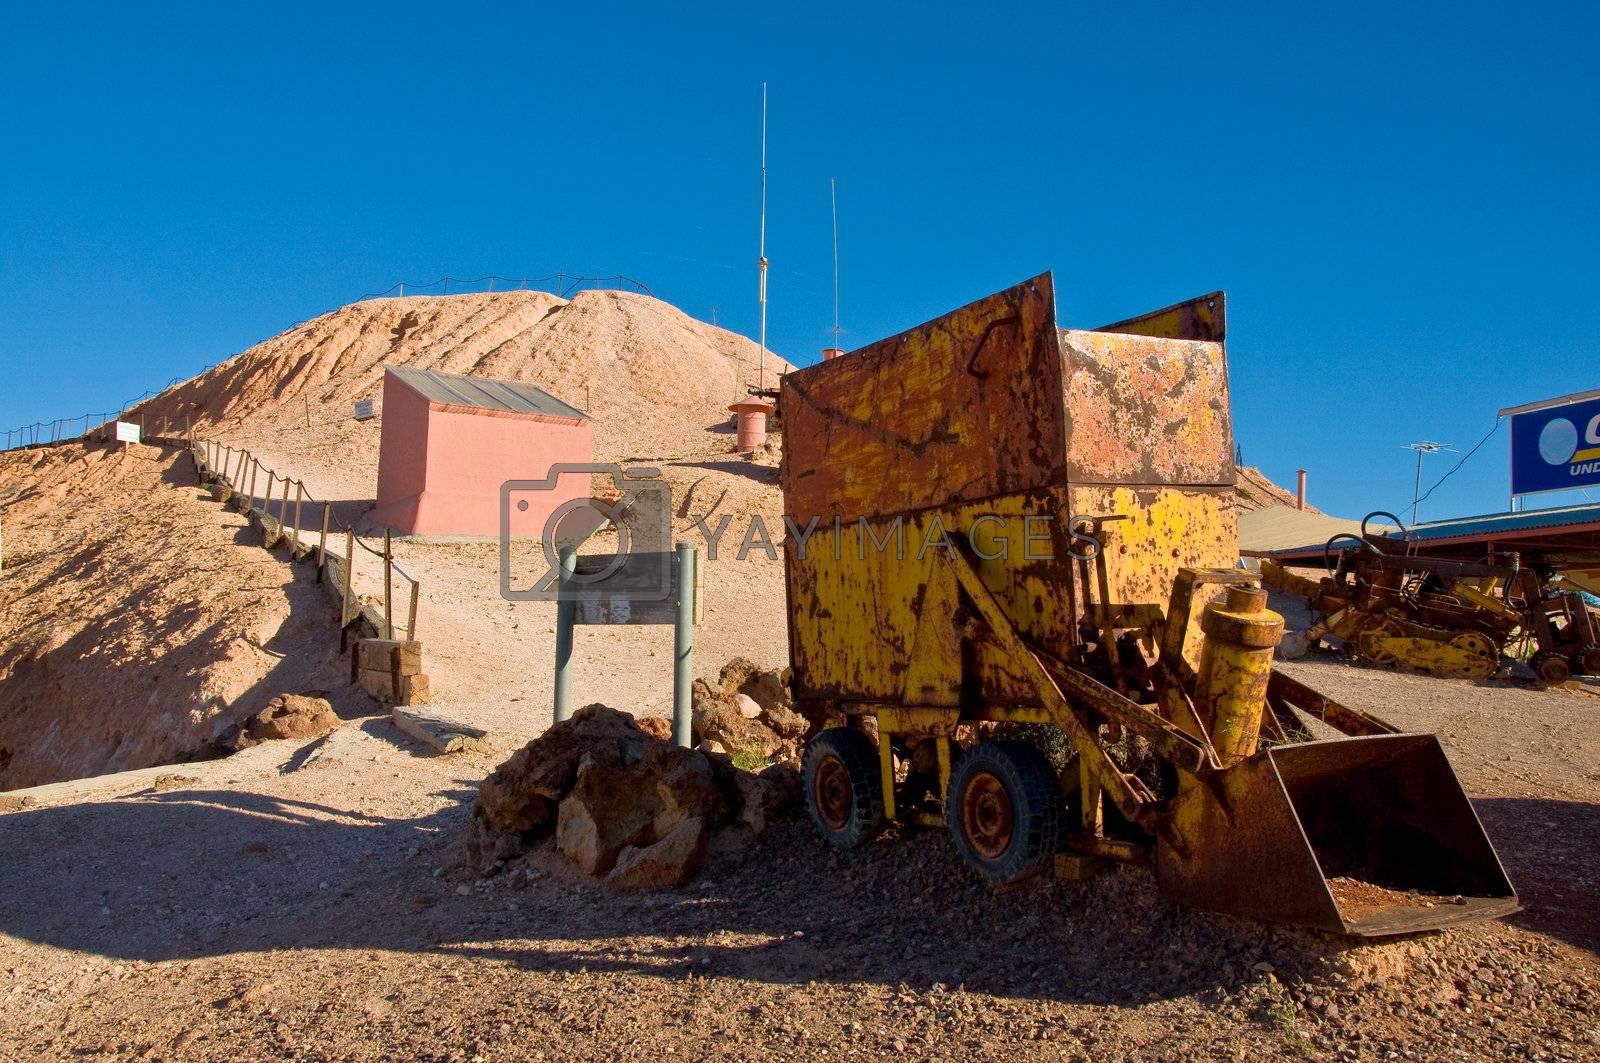 small city of coober pedy, outback australia